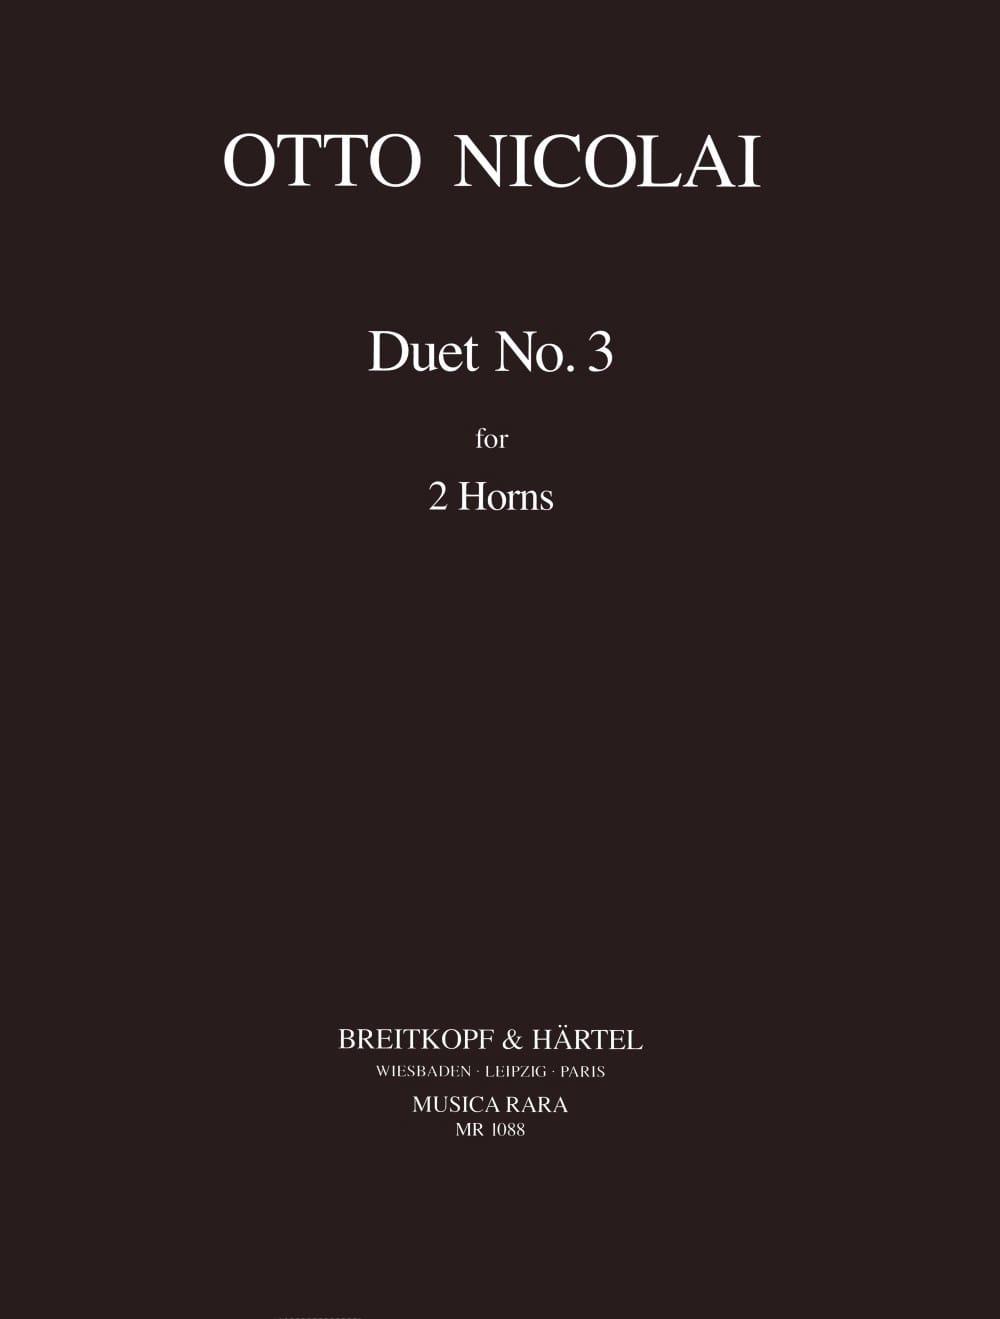 Otto Nicolai - Duet N° 3 pour 2 cors - Partition - di-arezzo.fr